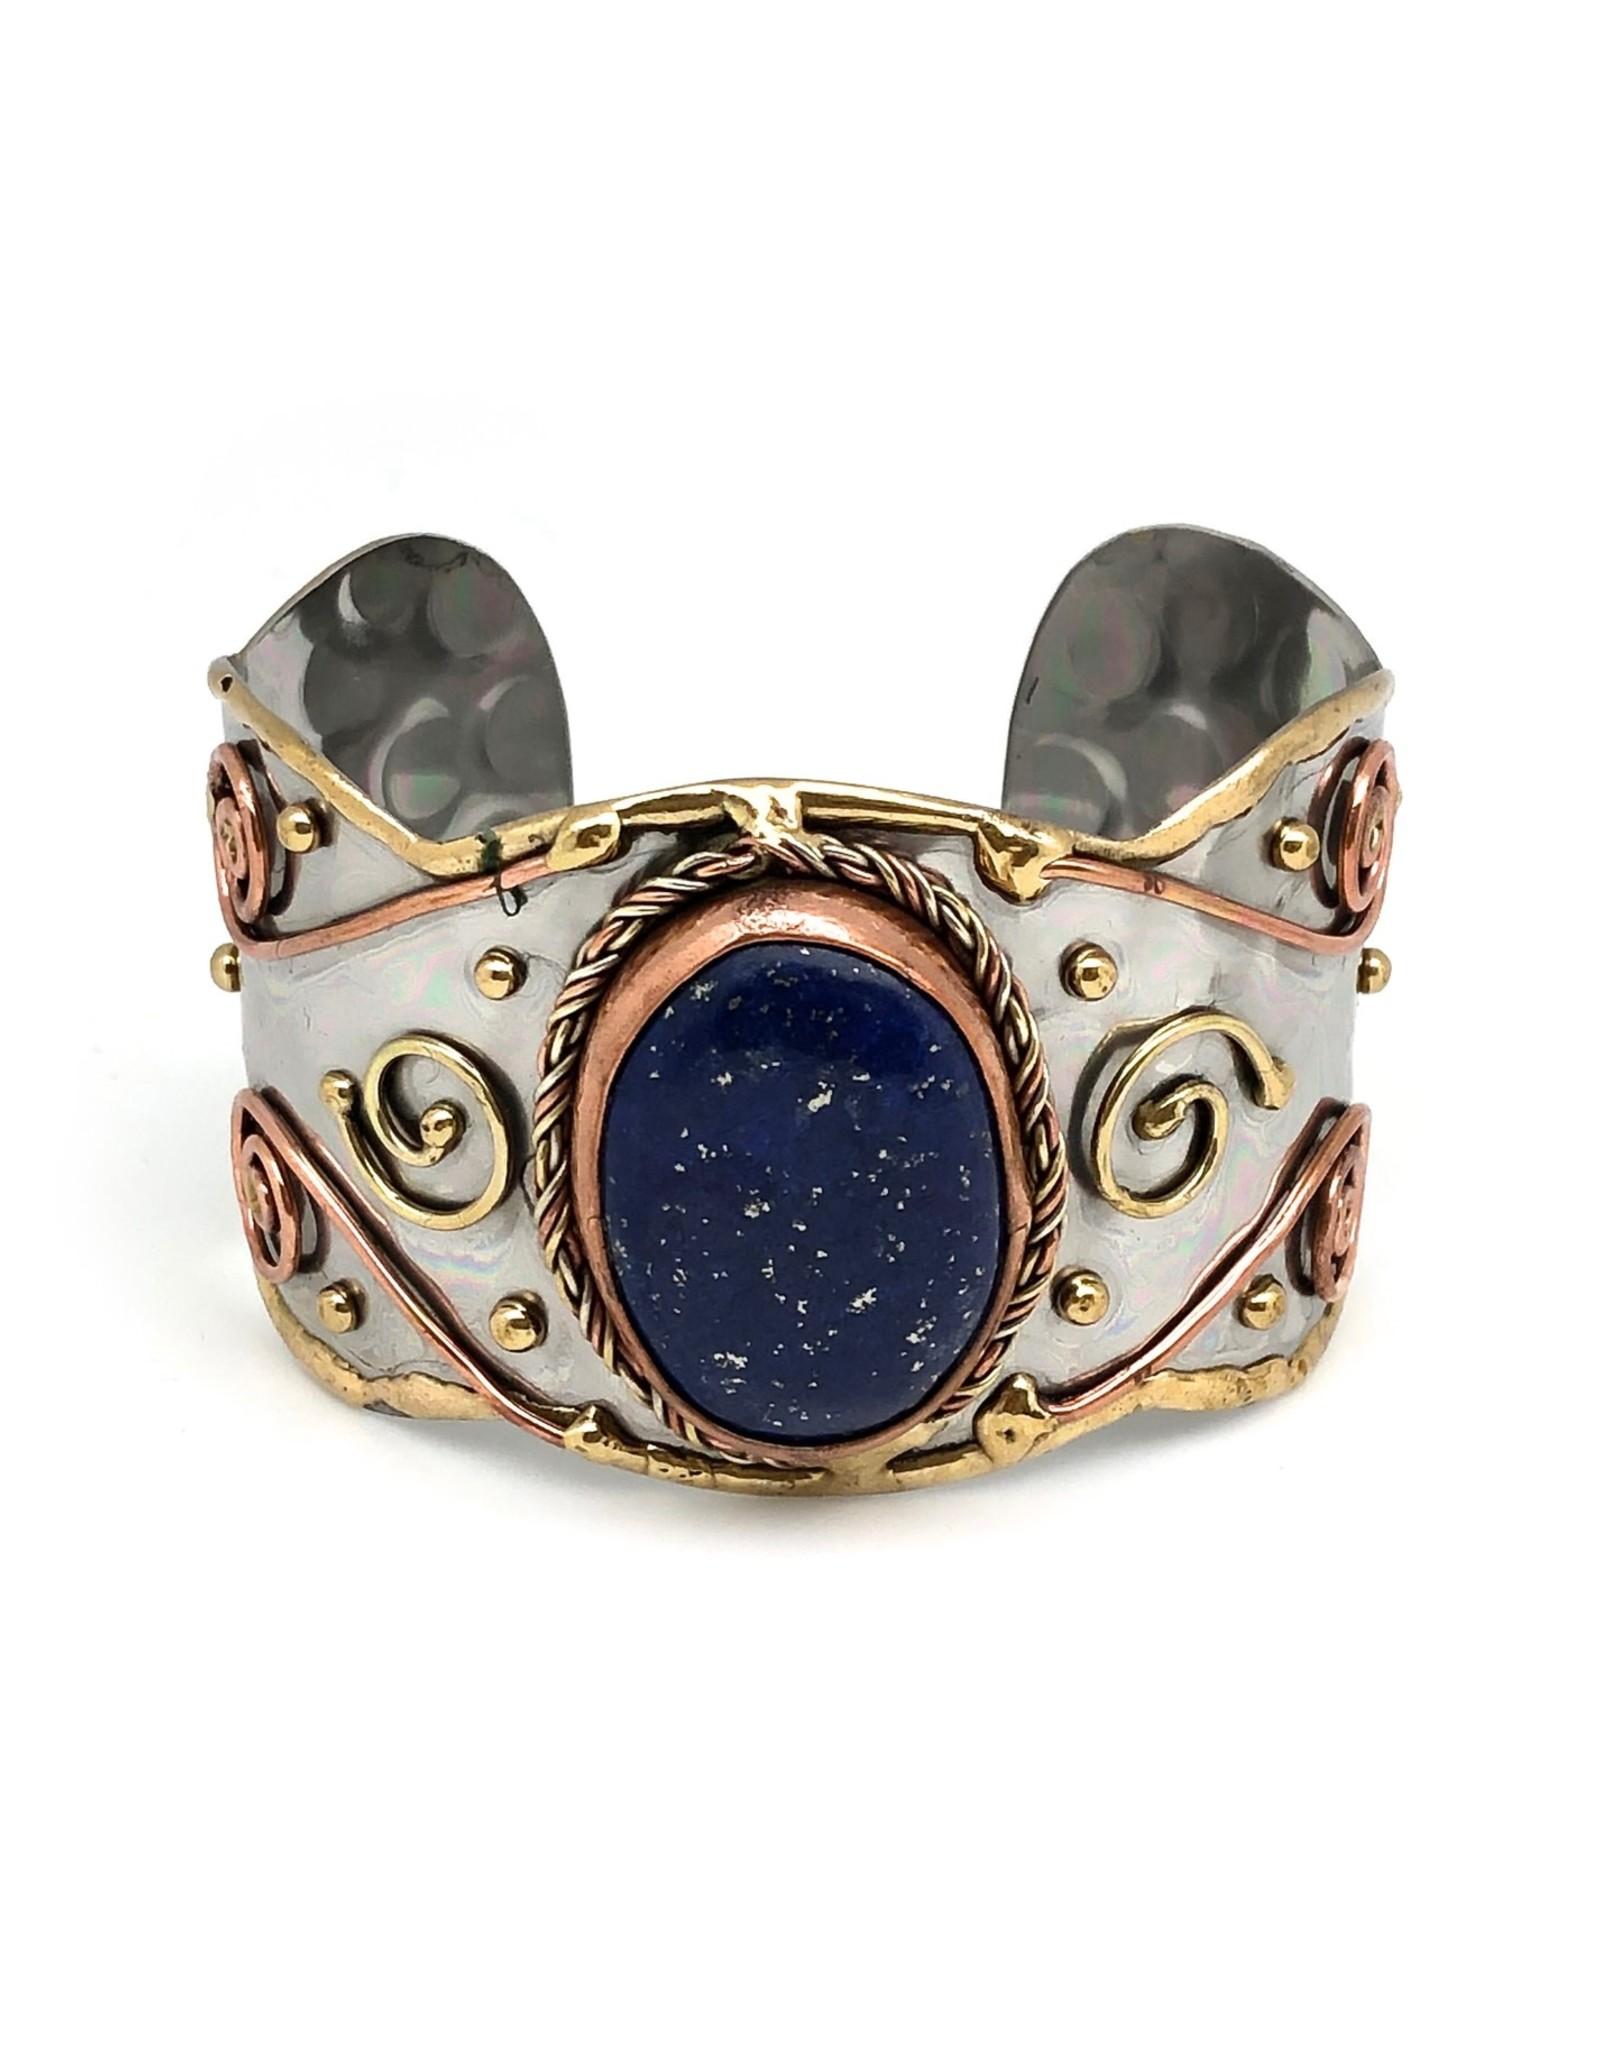 Faire/Anju Jewelry BRACELET-CUFF MIXED METAL LAPIS